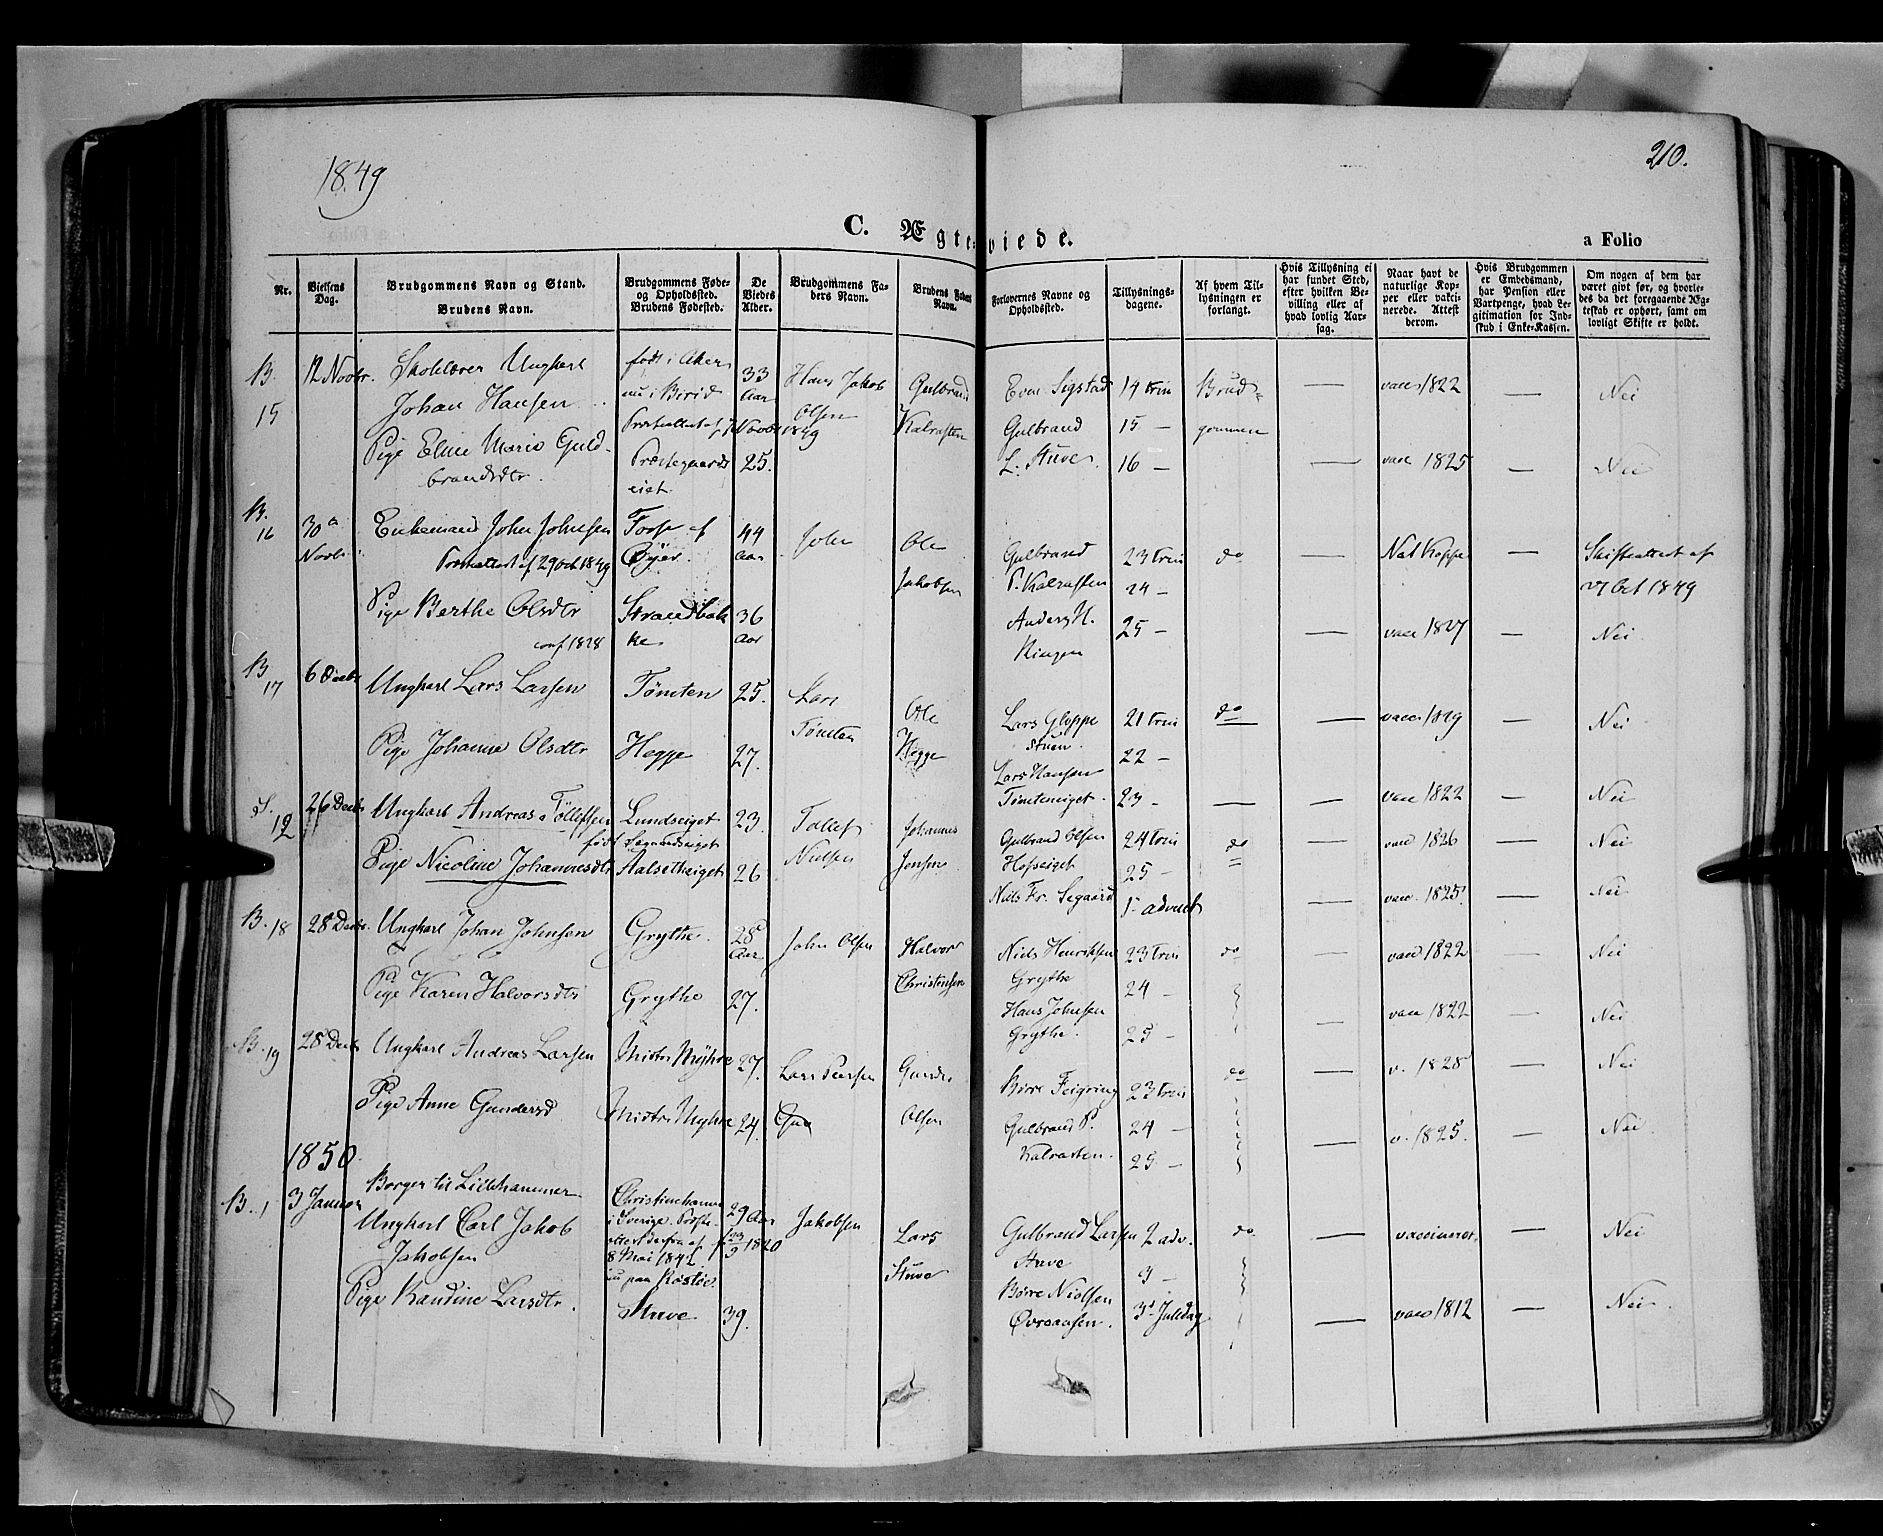 SAH, Biri prestekontor, Ministerialbok nr. 5, 1843-1854, s. 210